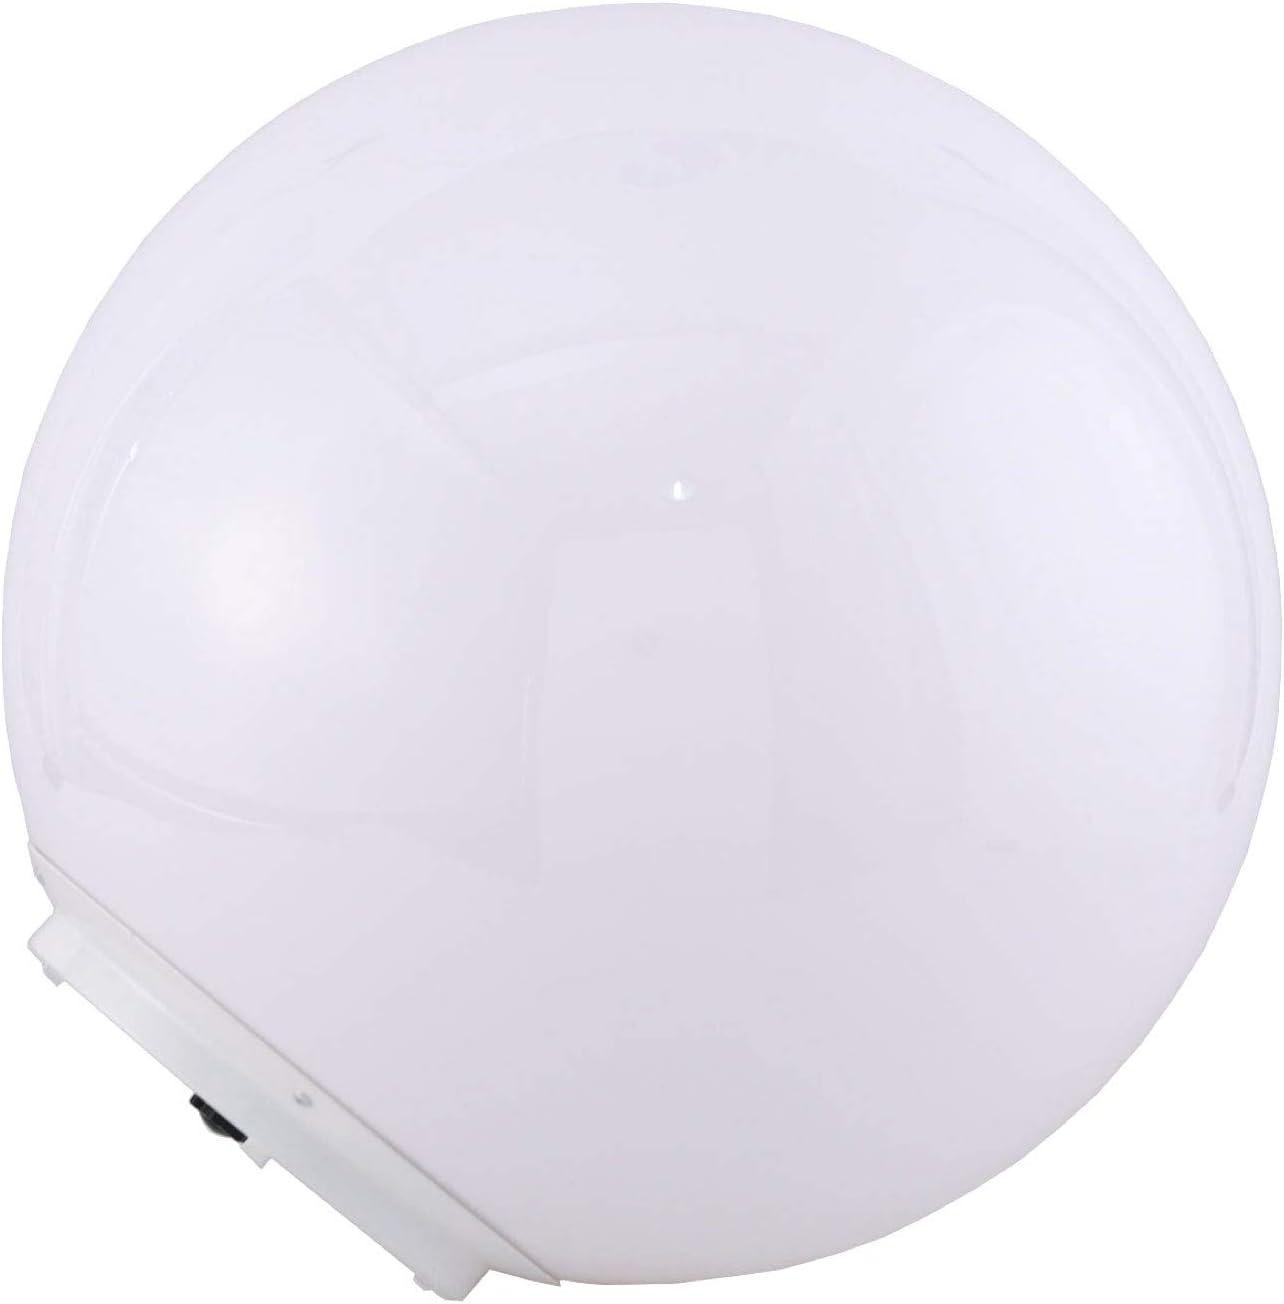 GTX Studio 50cm Soft Diffuser Ball for Bowens Adapter